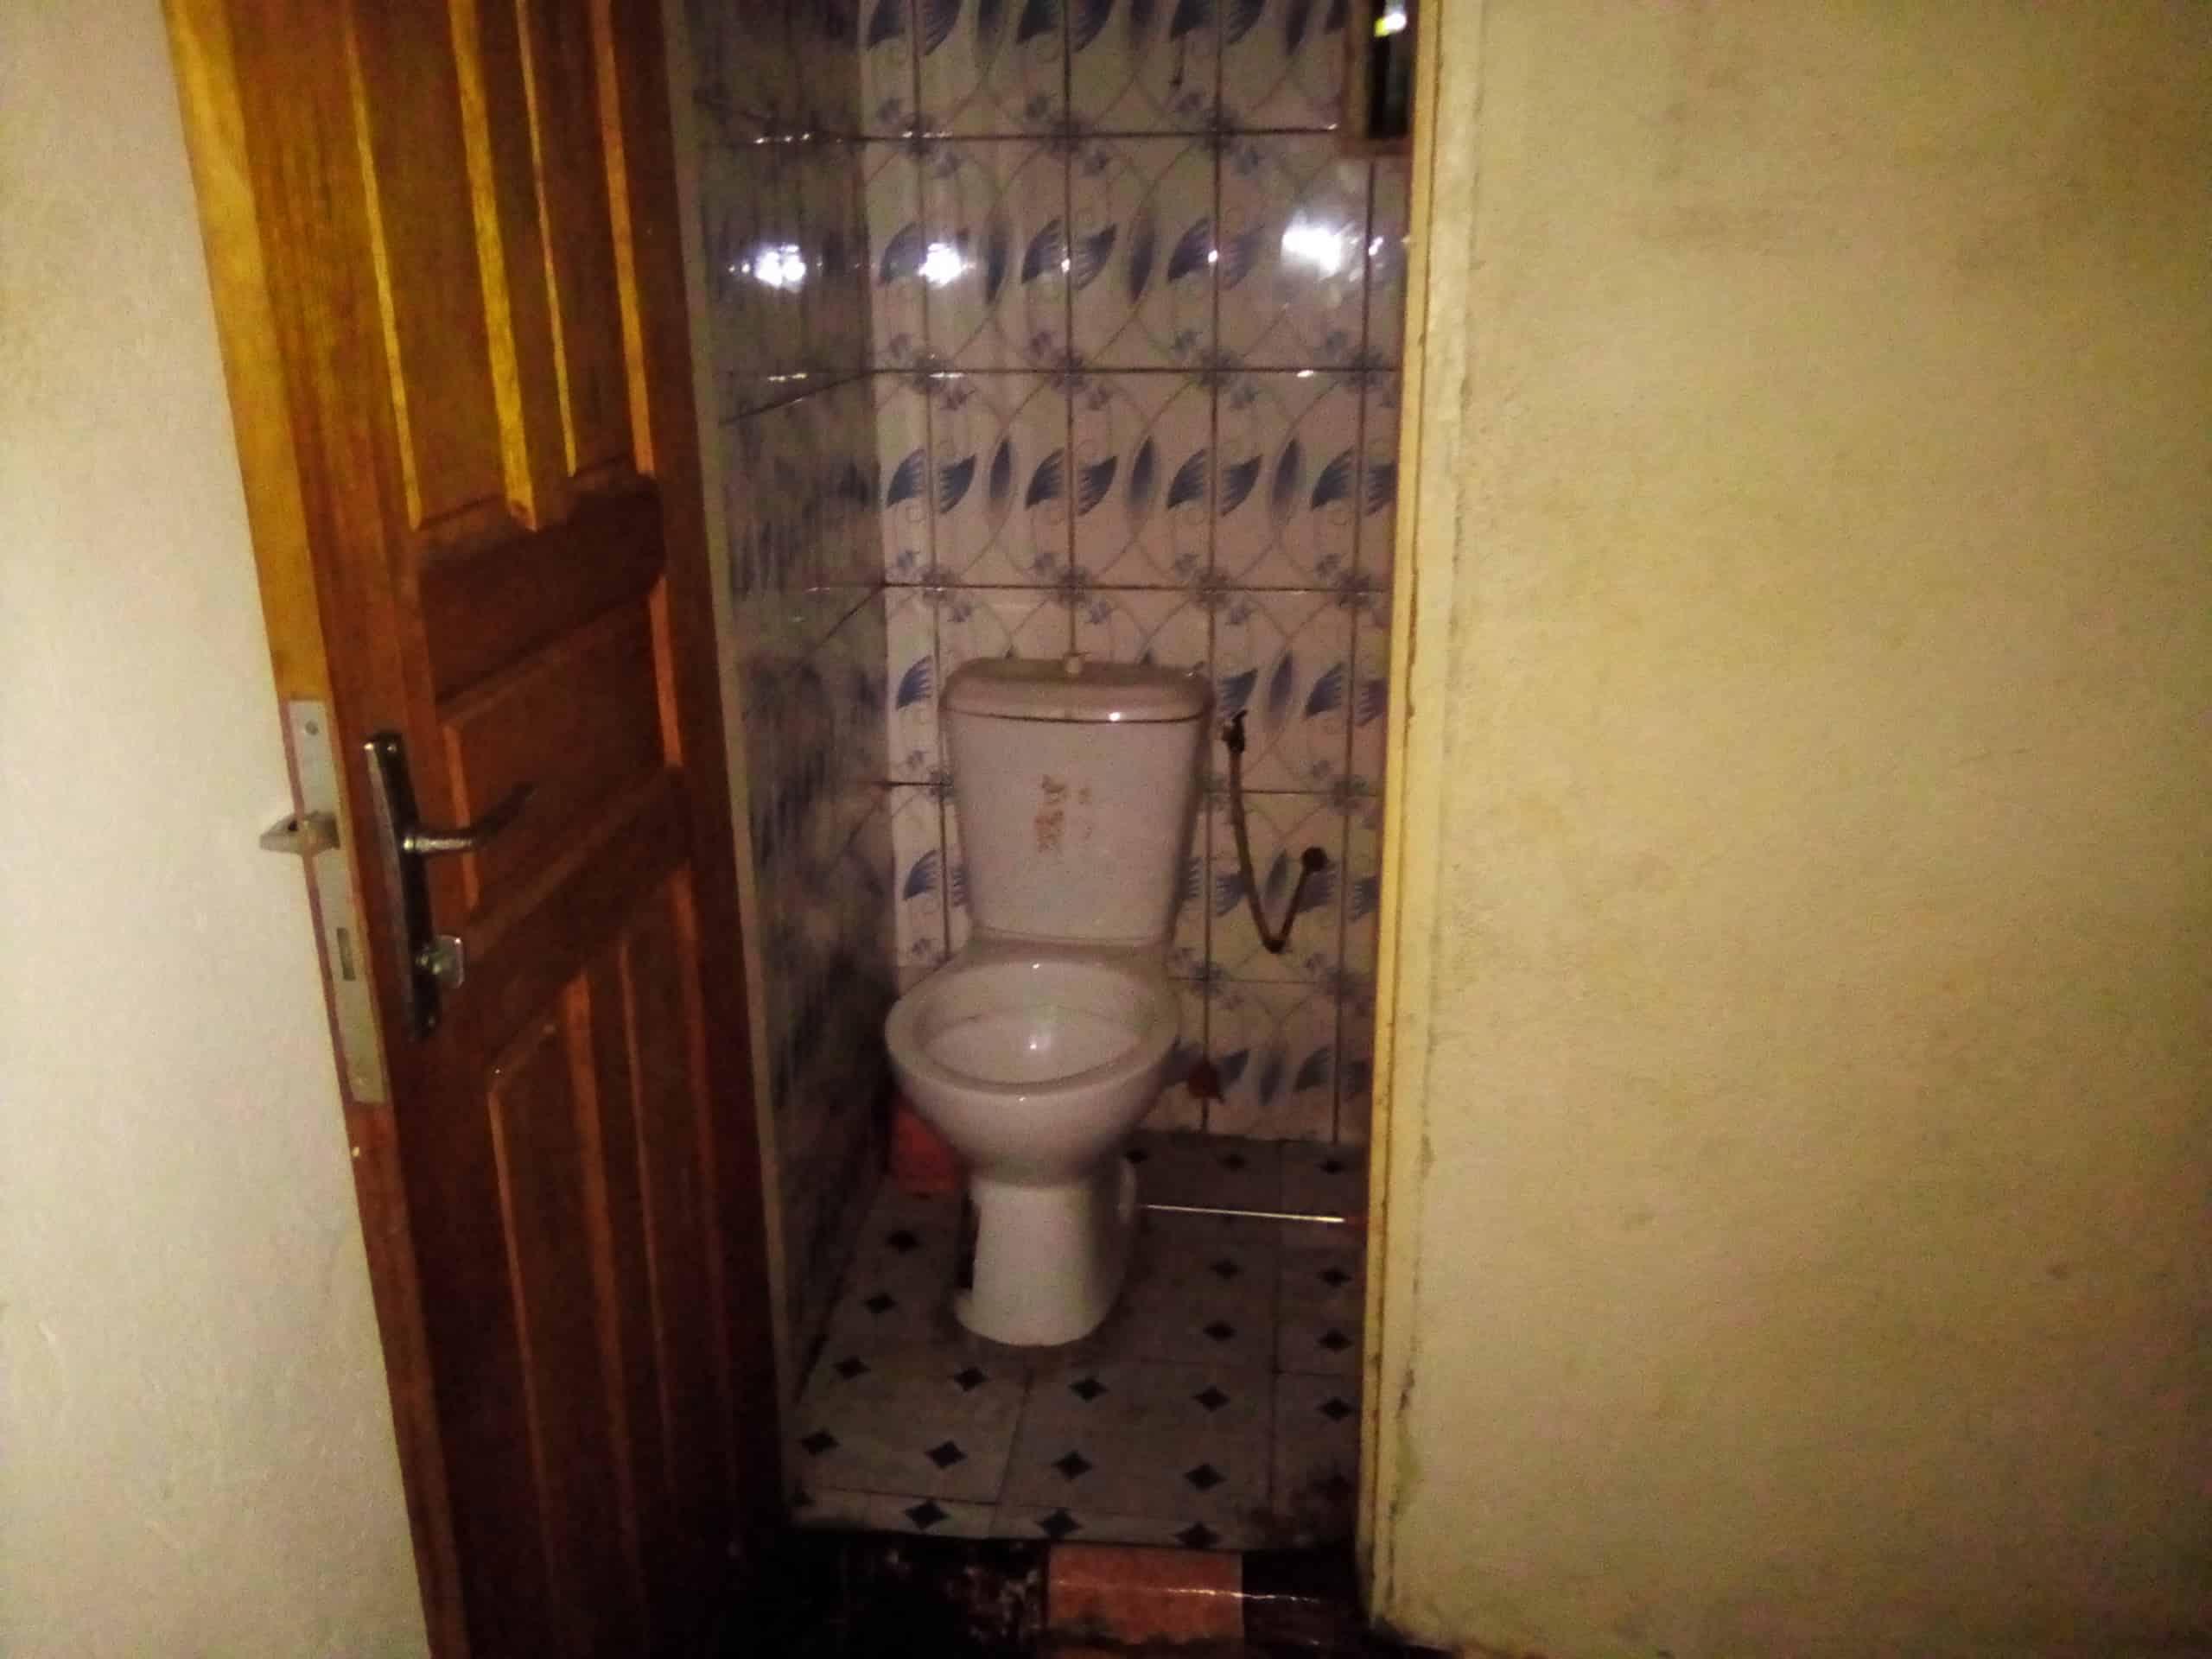 Apartment to rent - Douala, Kotto, kotto - 1 living room(s), 1 bedroom(s), 1 bathroom(s) - 35 000 FCFA / month